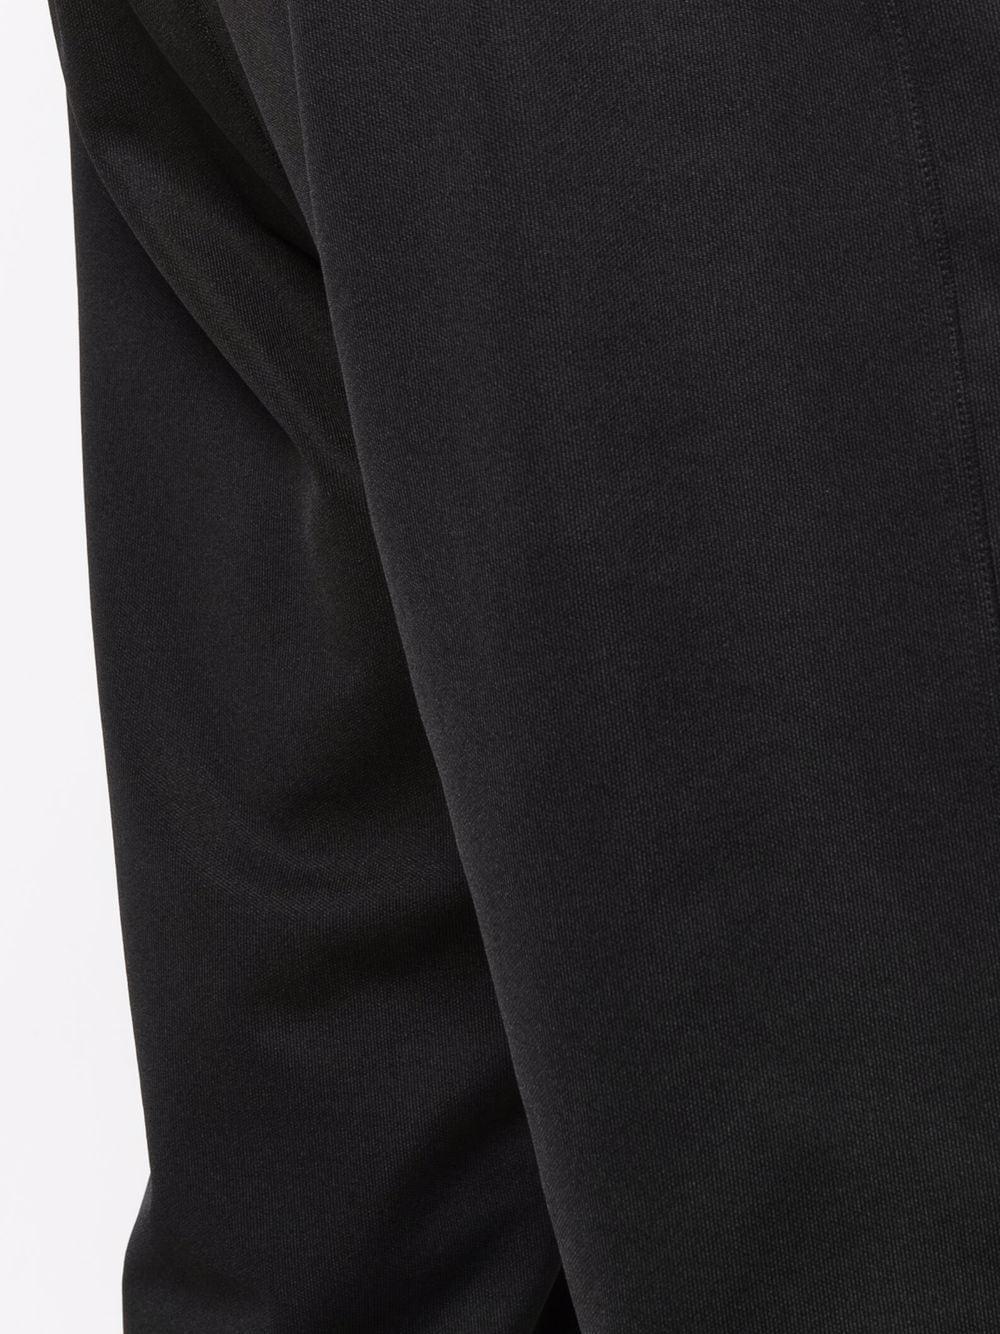 pantaloni sportivi uomo neri KENZO | Pantaloni | FB65PA7514IP99